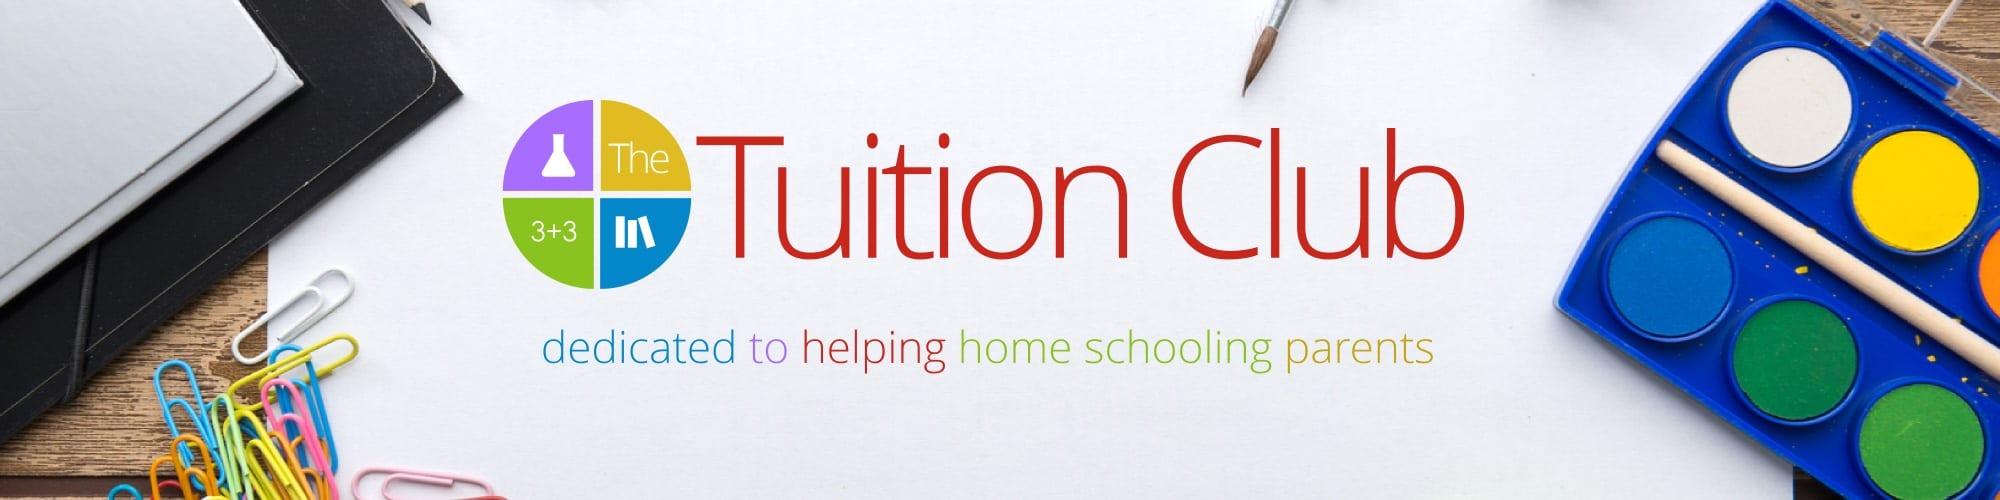 tutiion-club-banner